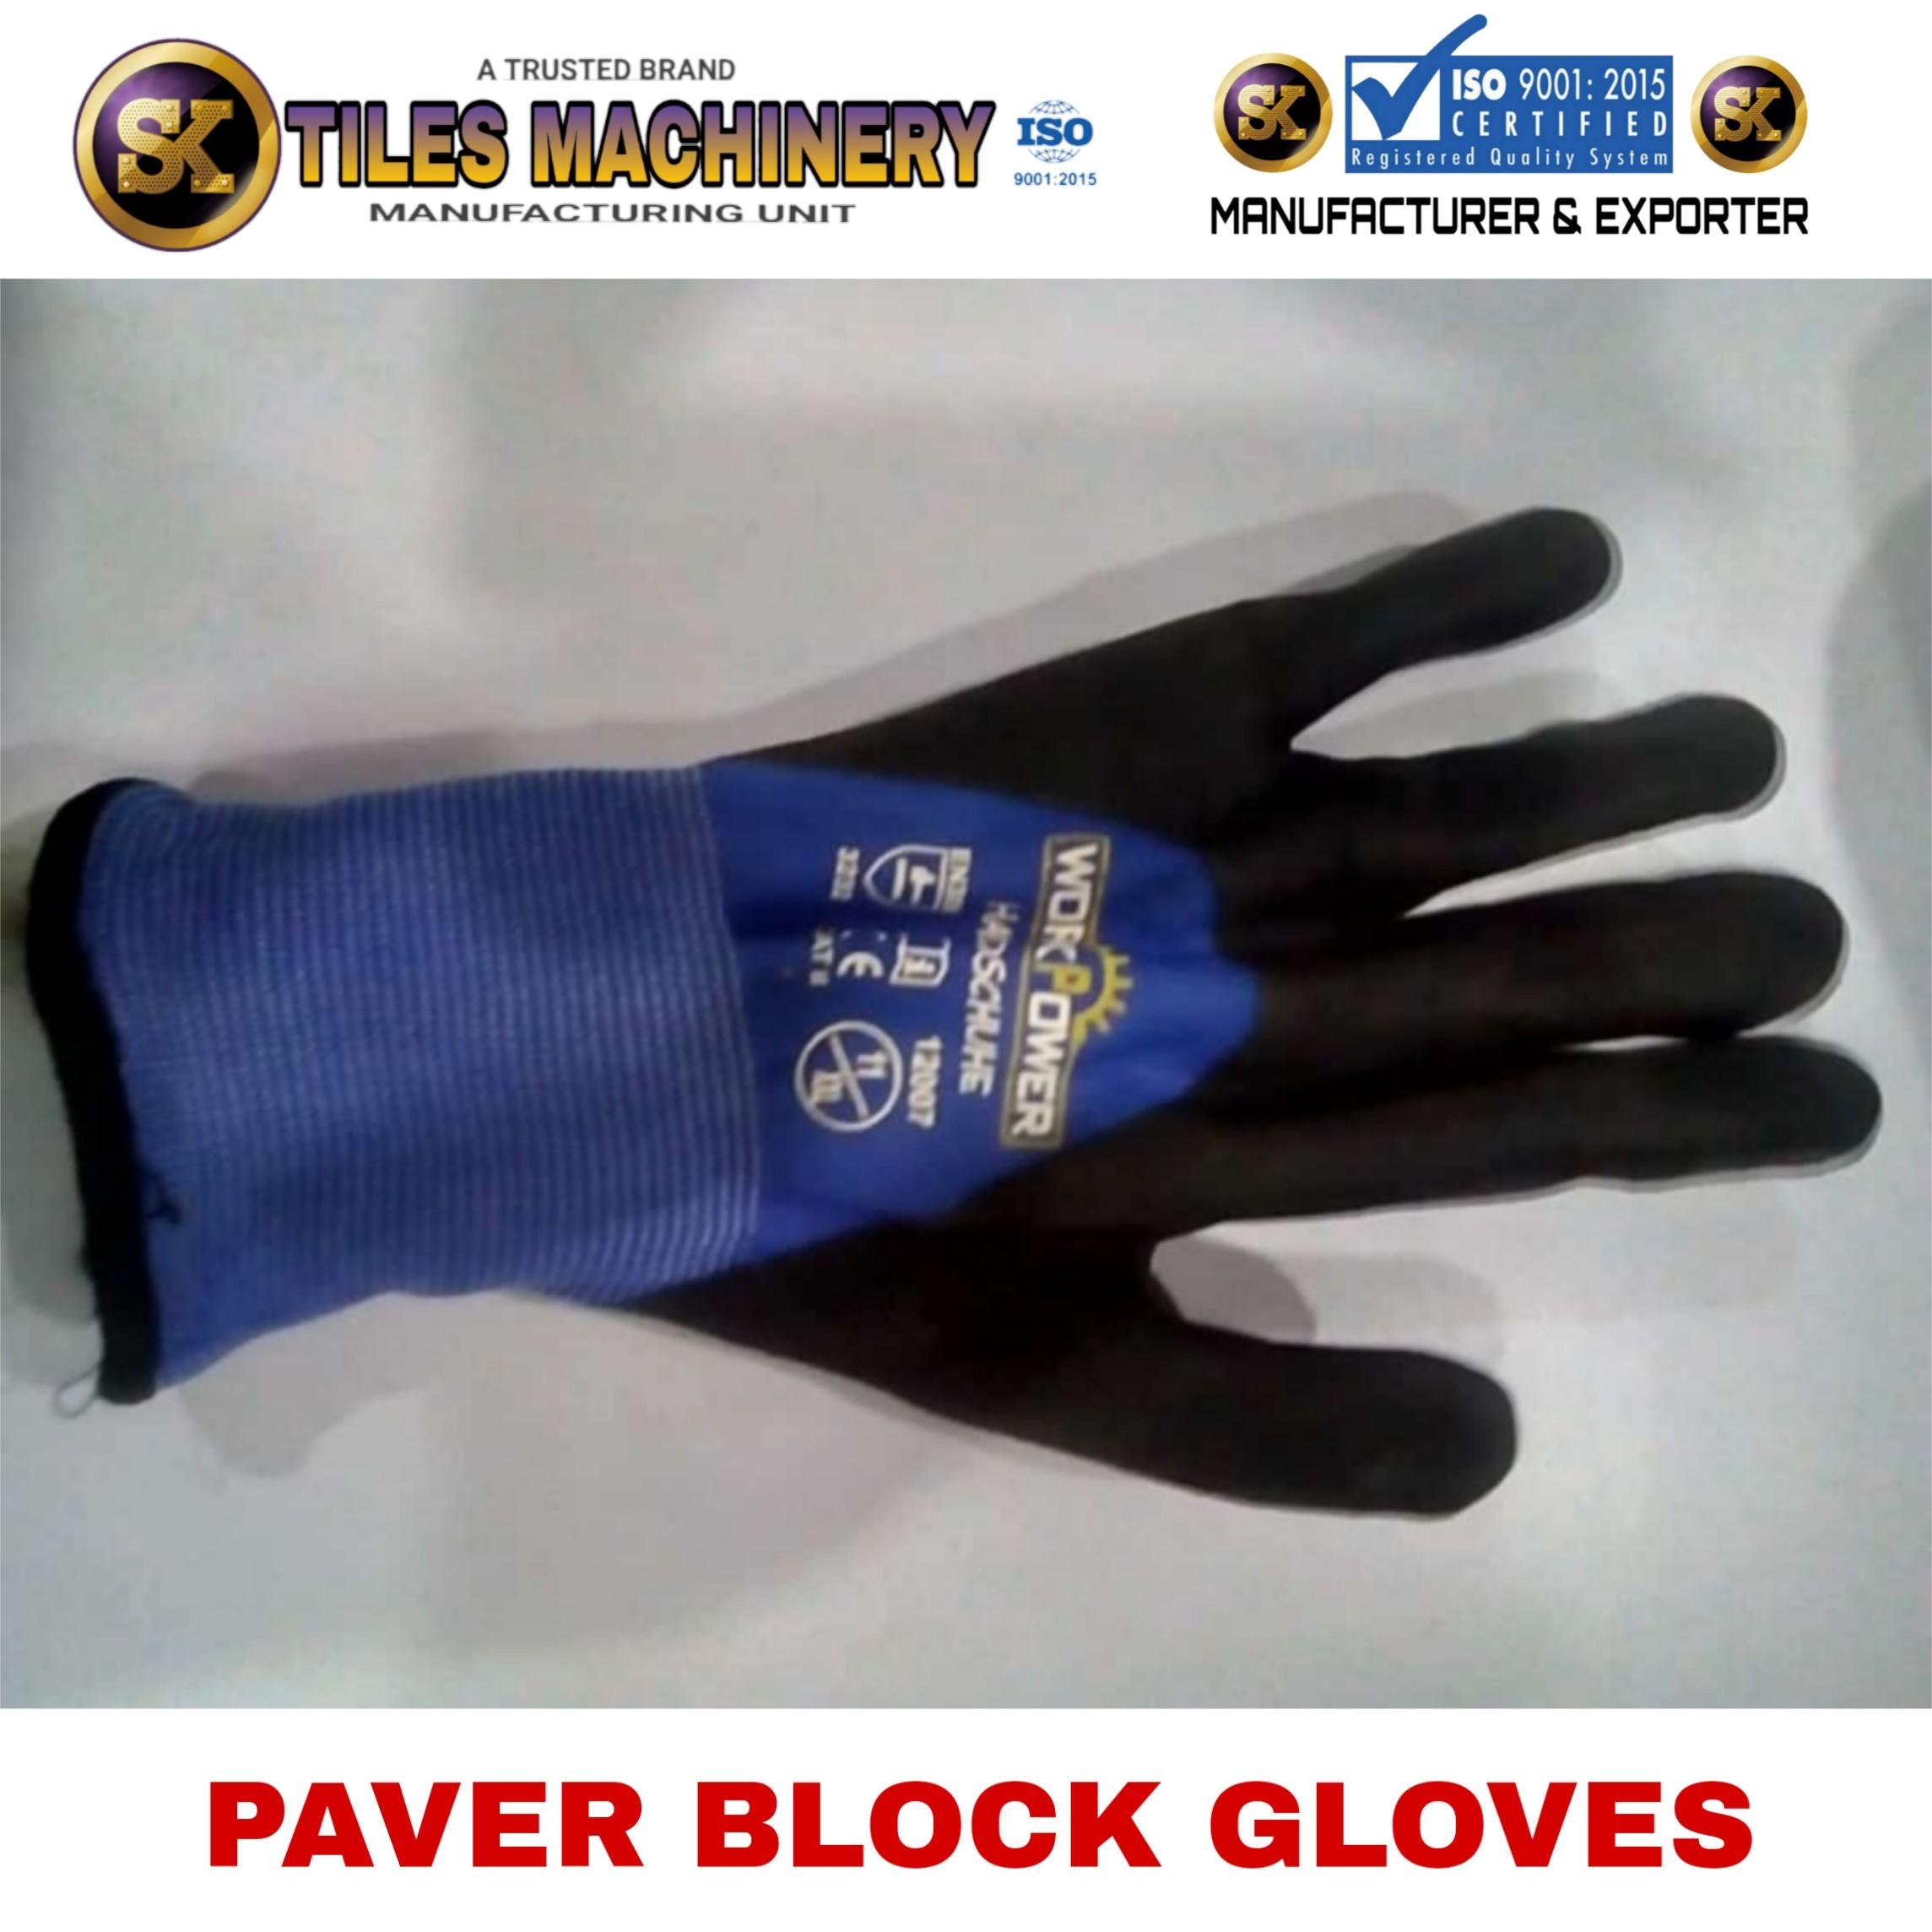 Rubber Gloves For Paver Block